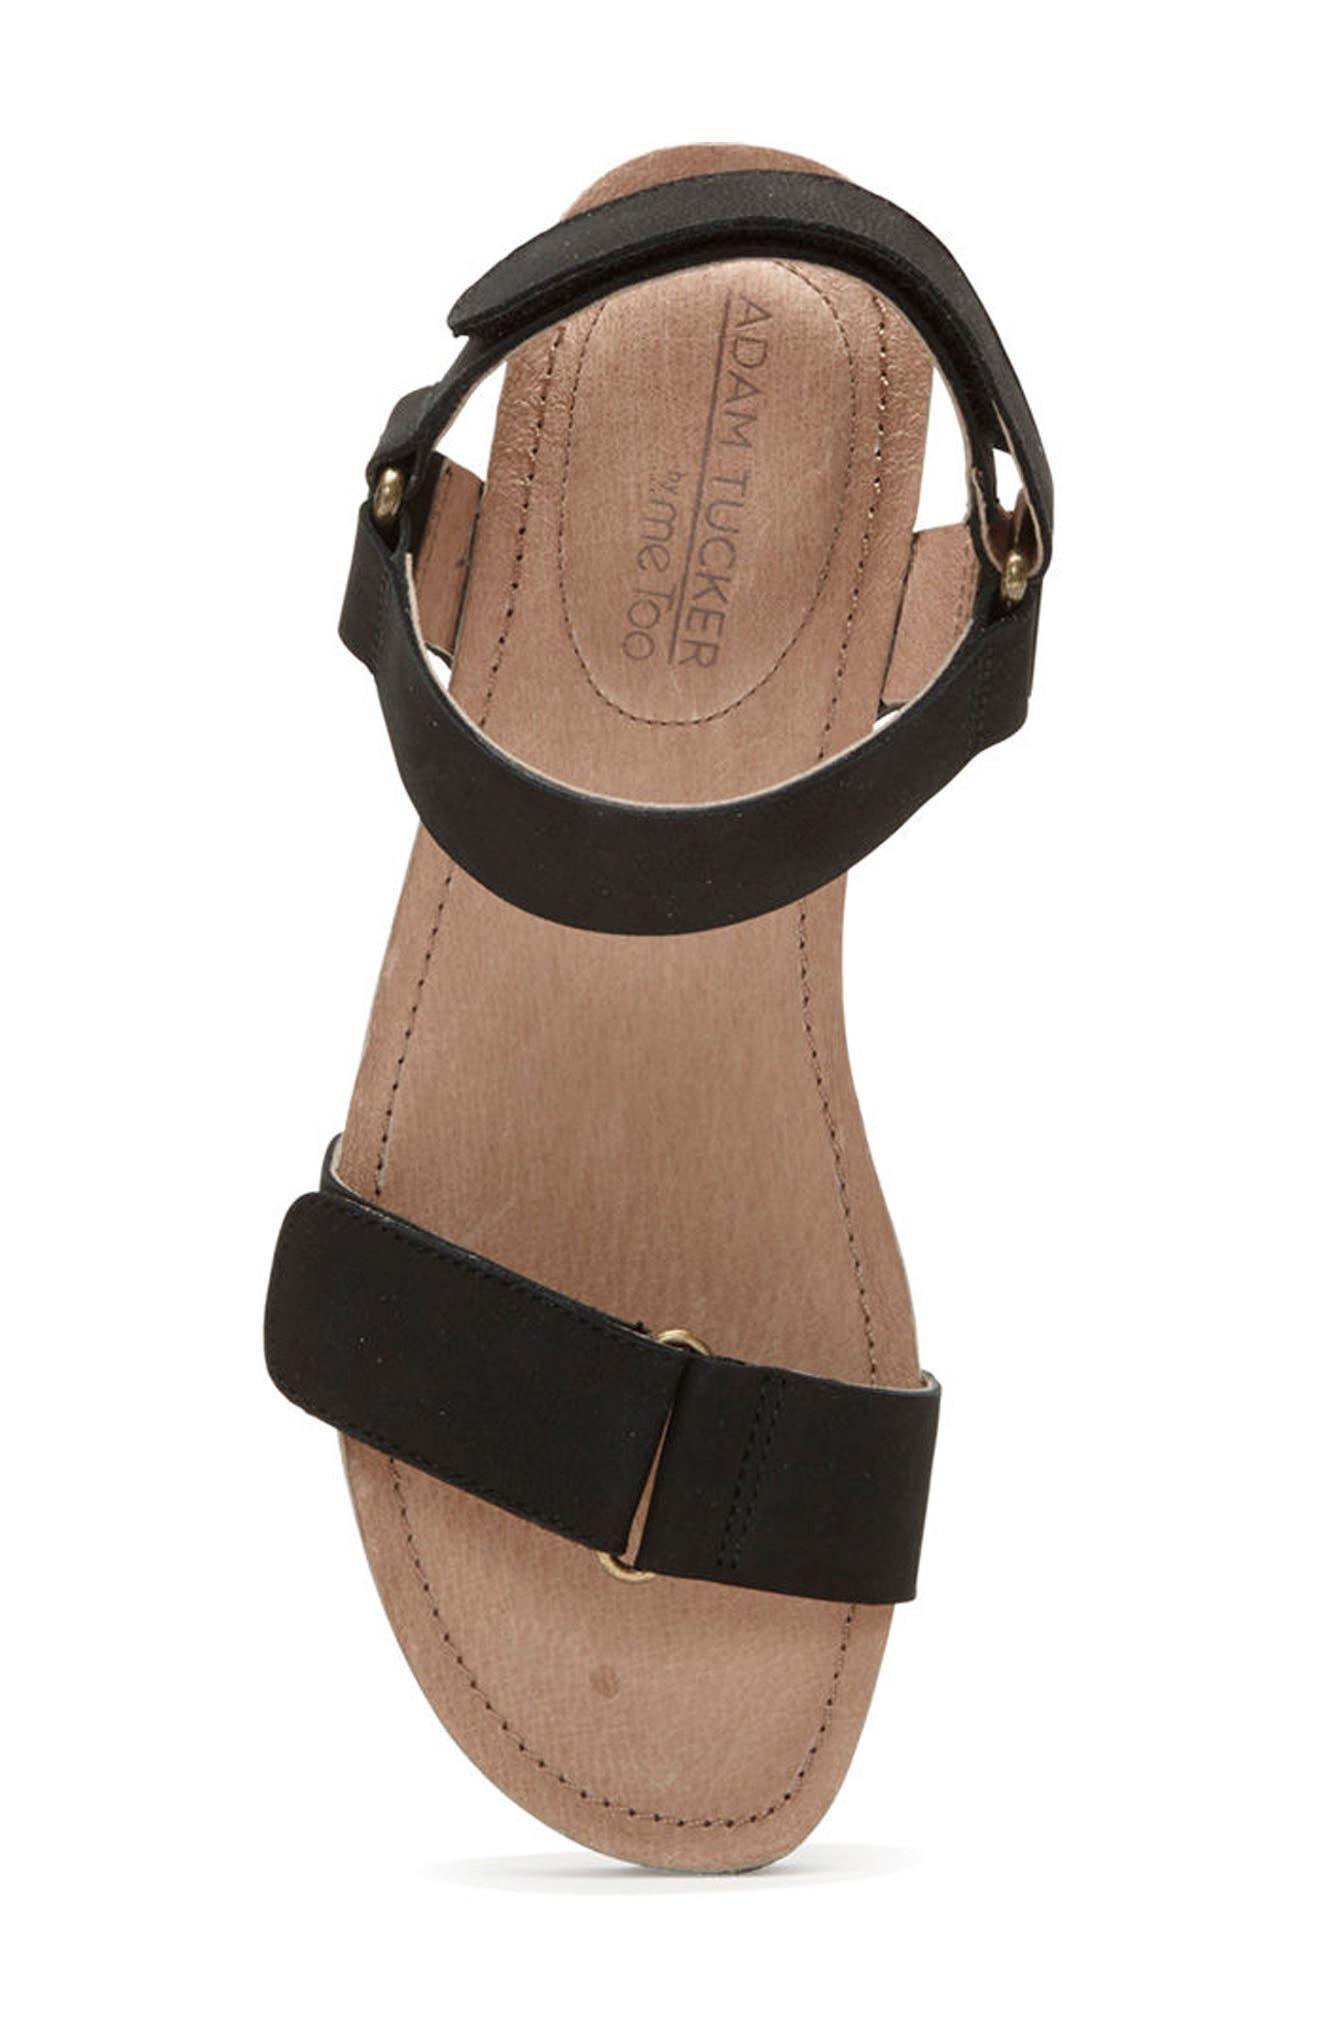 Adam Tucker Shea Wedge Sandal,                             Alternate thumbnail 5, color,                             Black Nubuck Leather